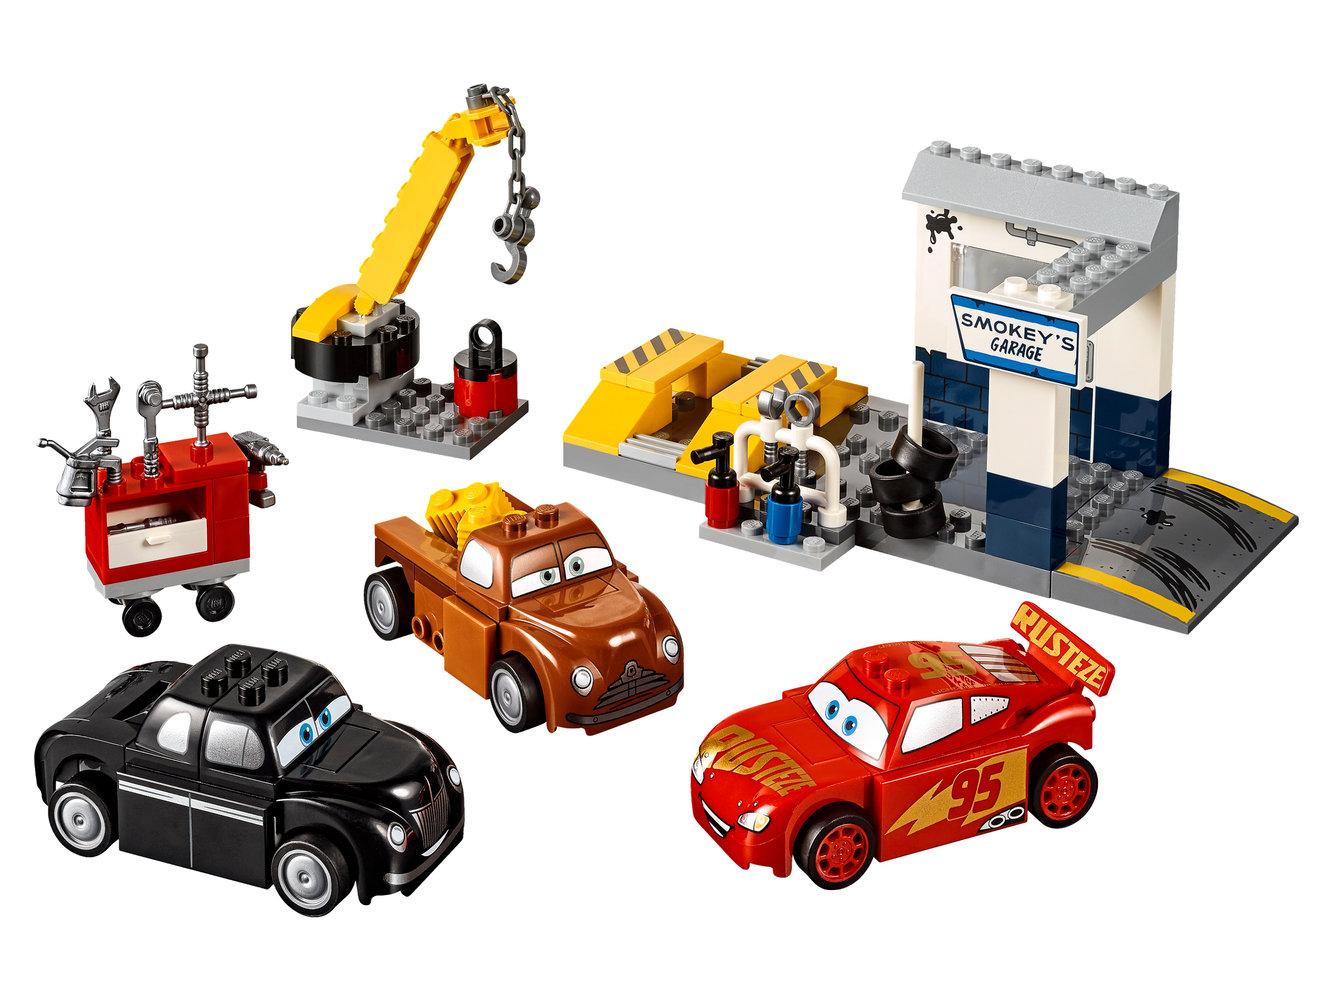 Smokey's Garage